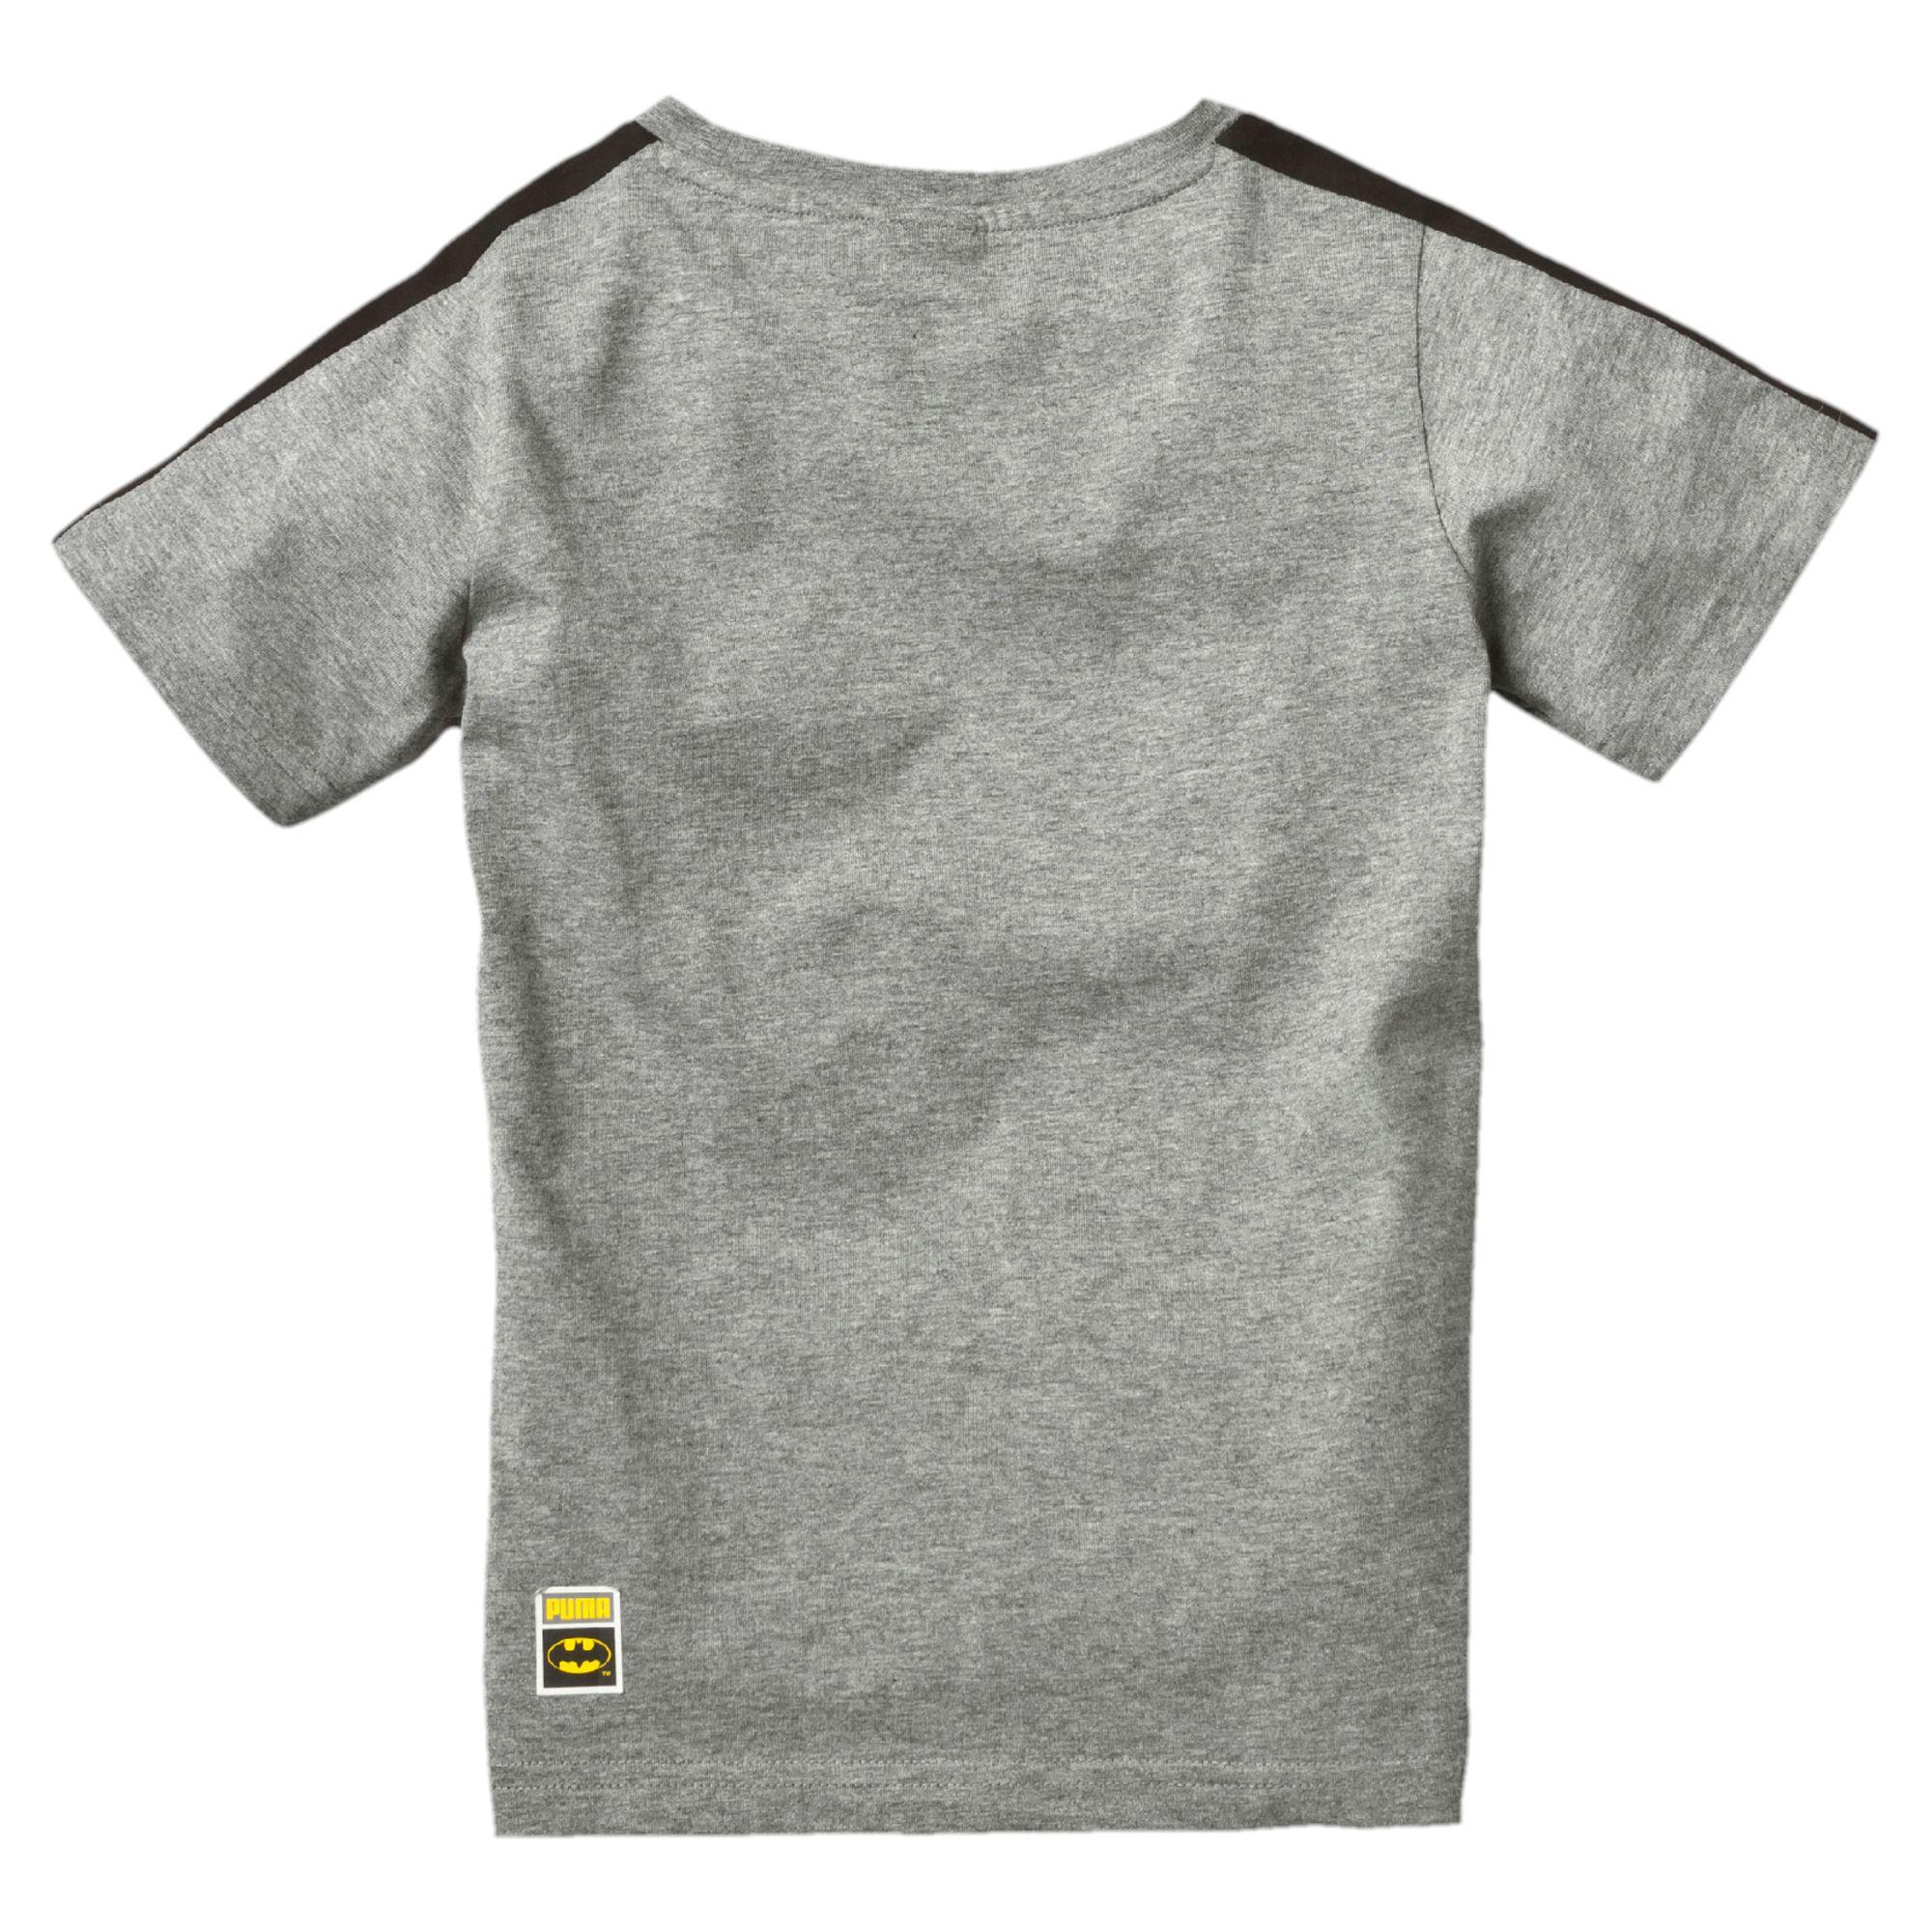 Puma Batman Boys T Shirt Kids Tee Boys New Ebay